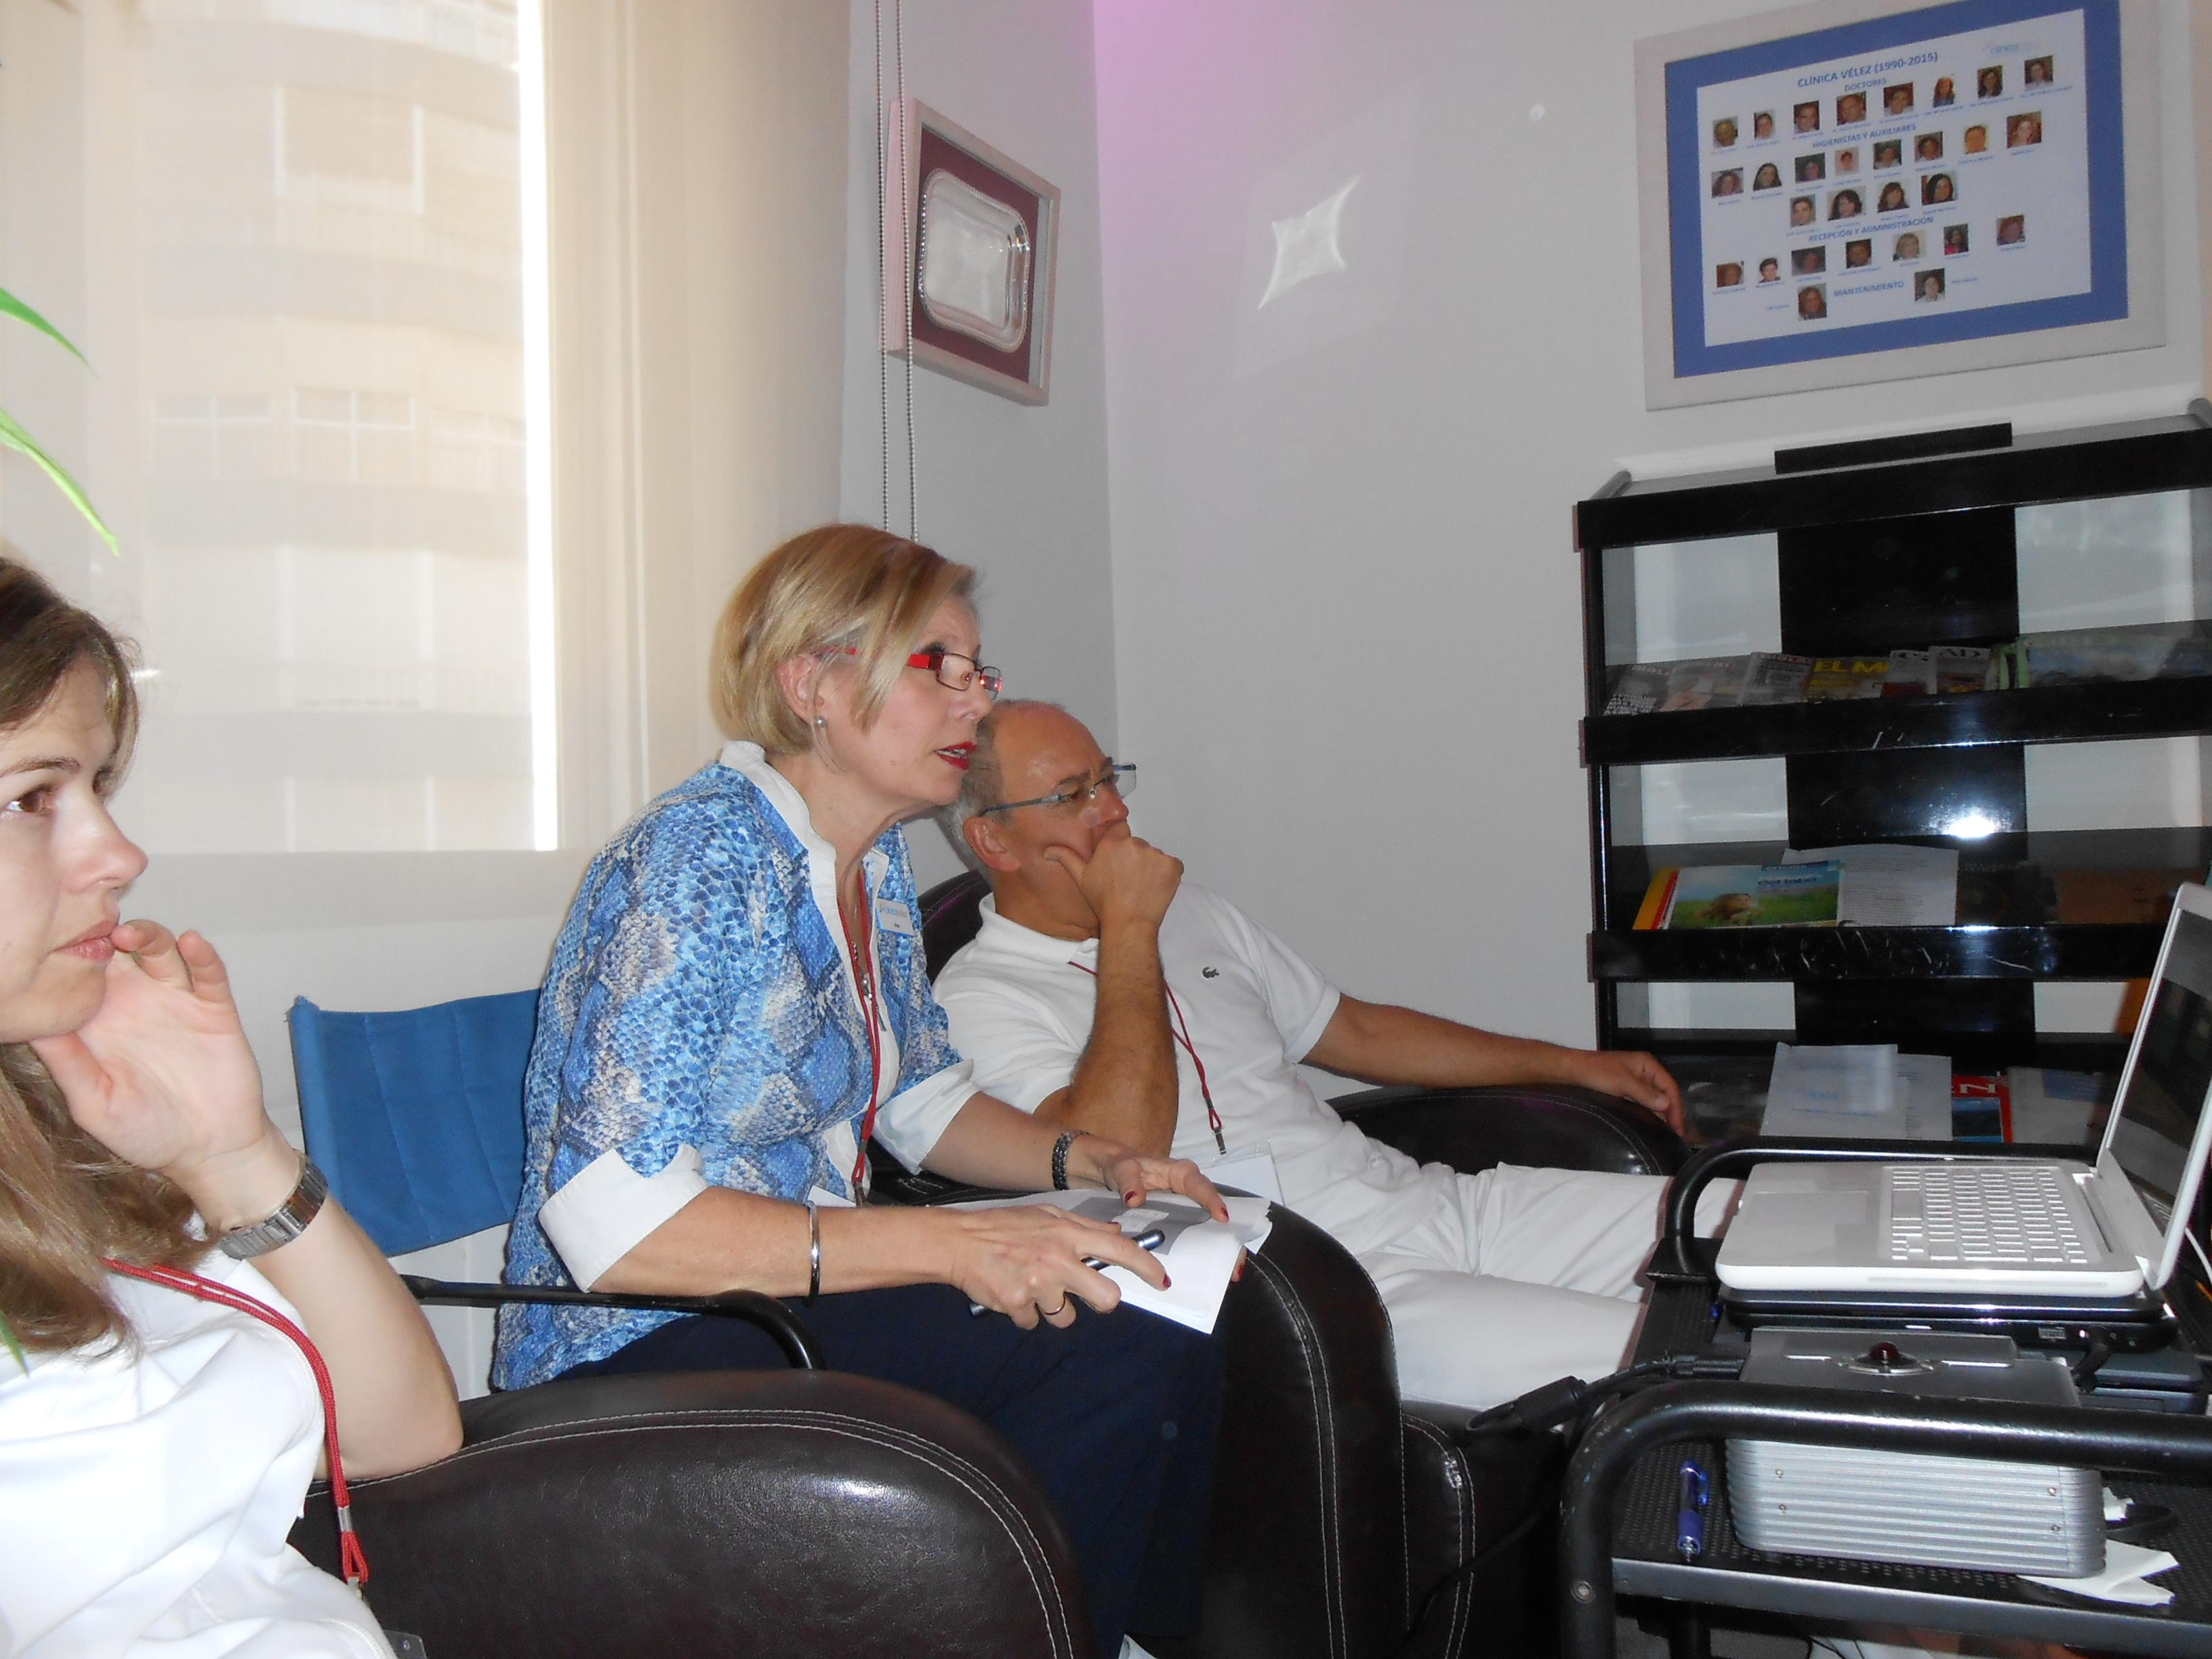 http://clinicavelez.es/wp-content/uploads/2016/07/DSCN0219.jpg